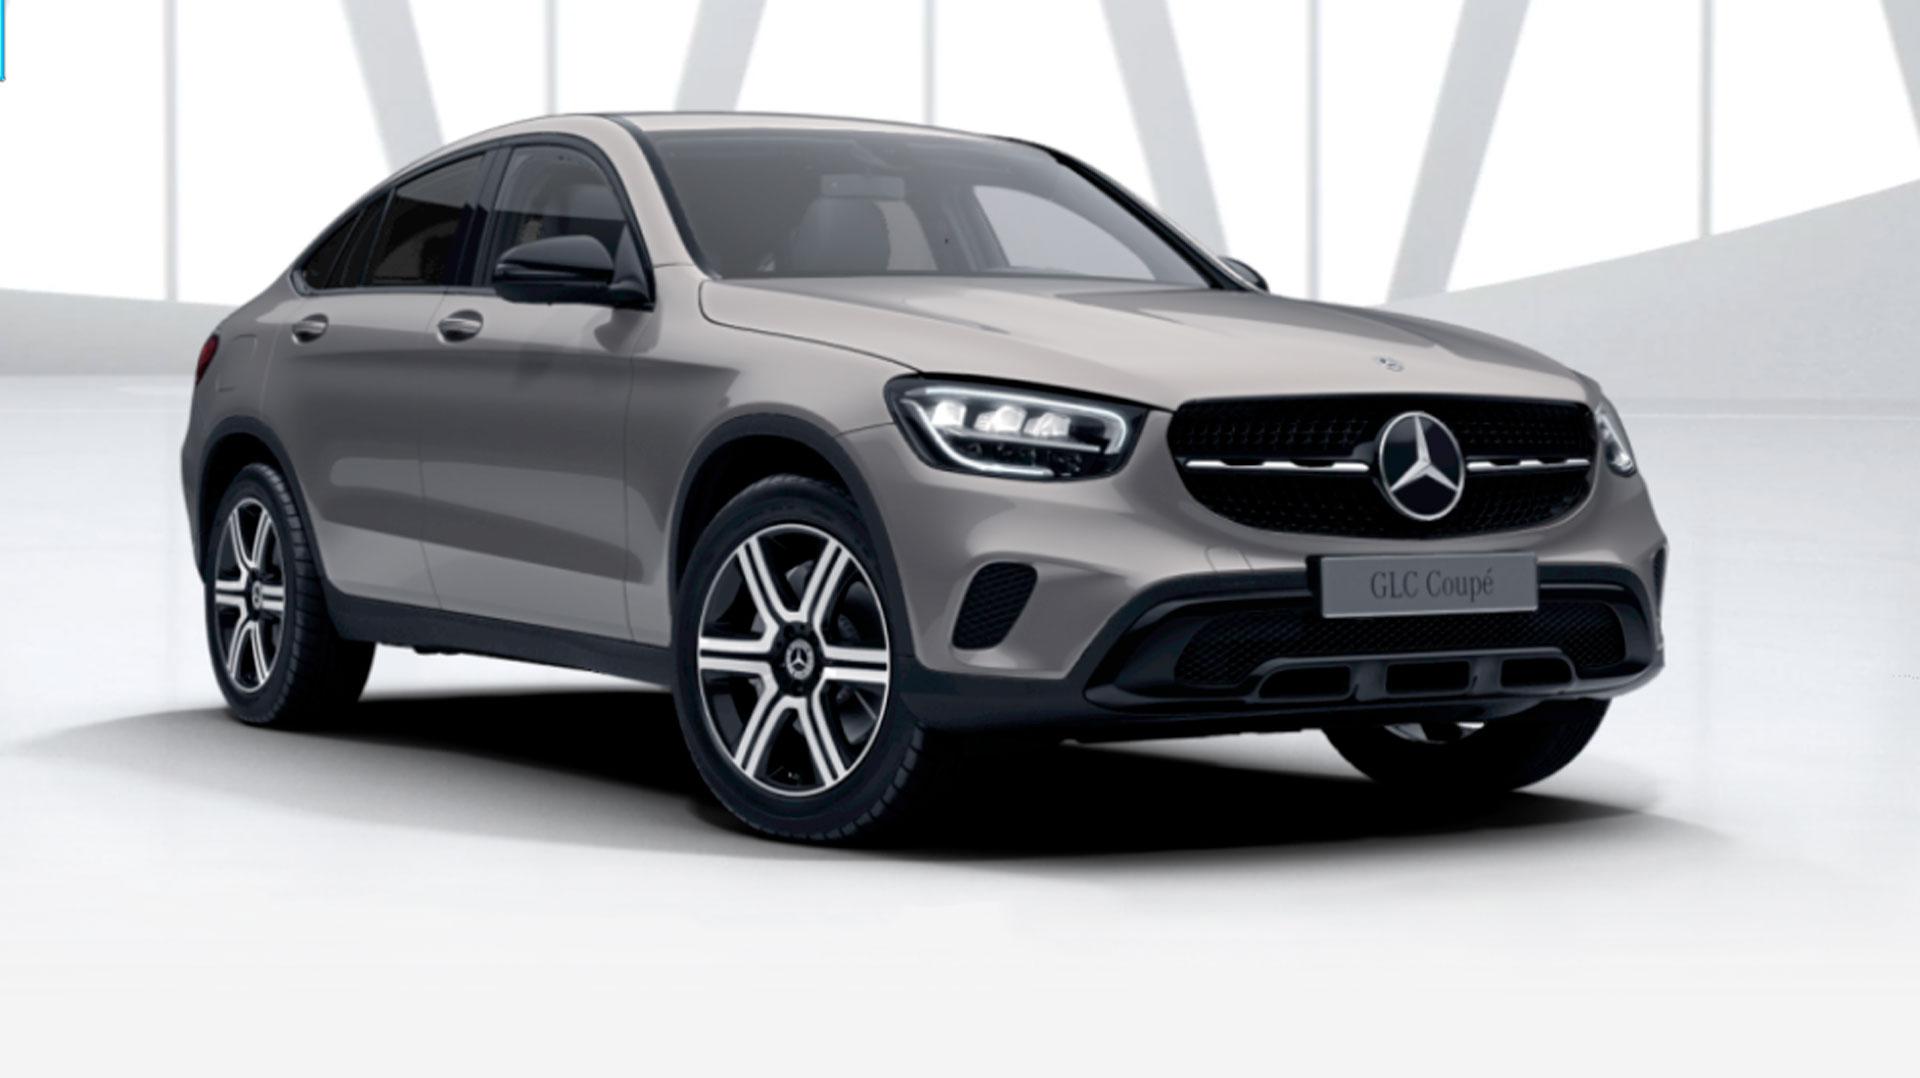 Mercedes-Benz GLC Coupe  0152601525